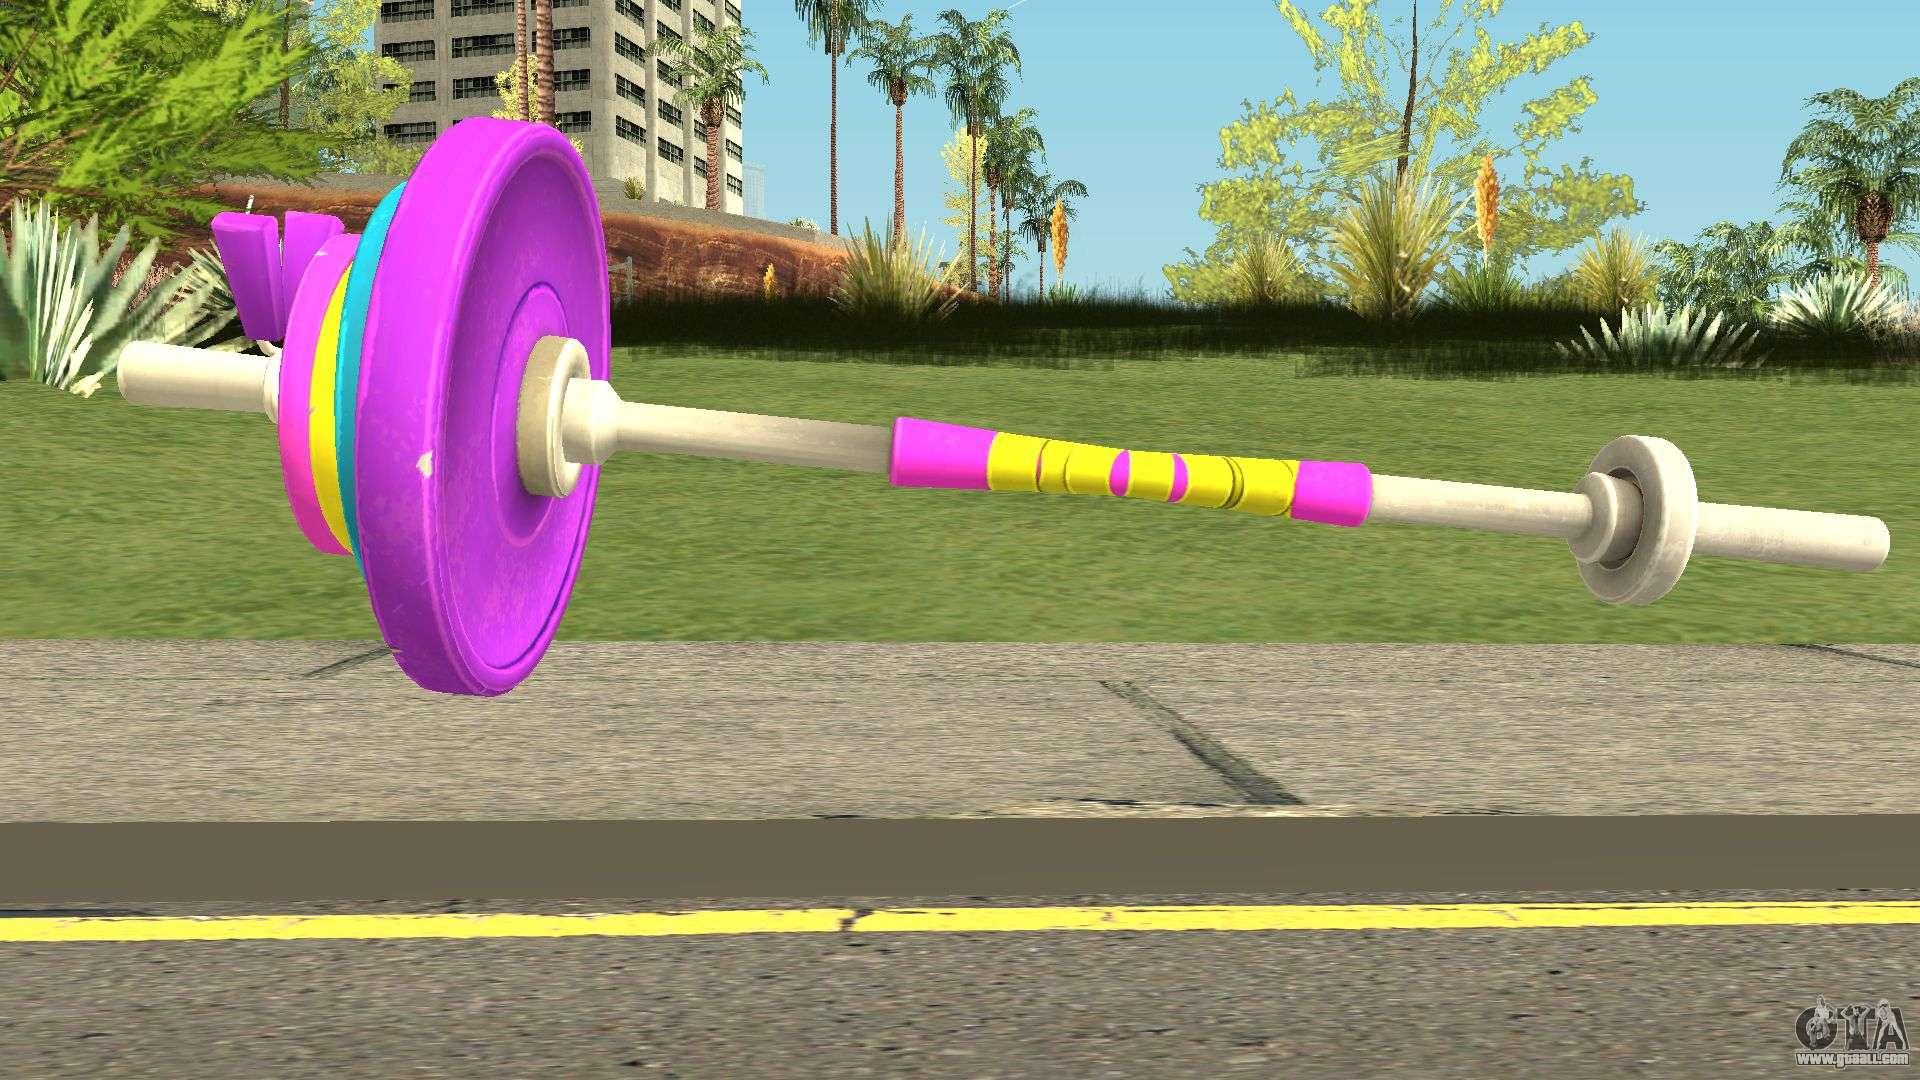 Fortnite Weapon For Gta San Andreas